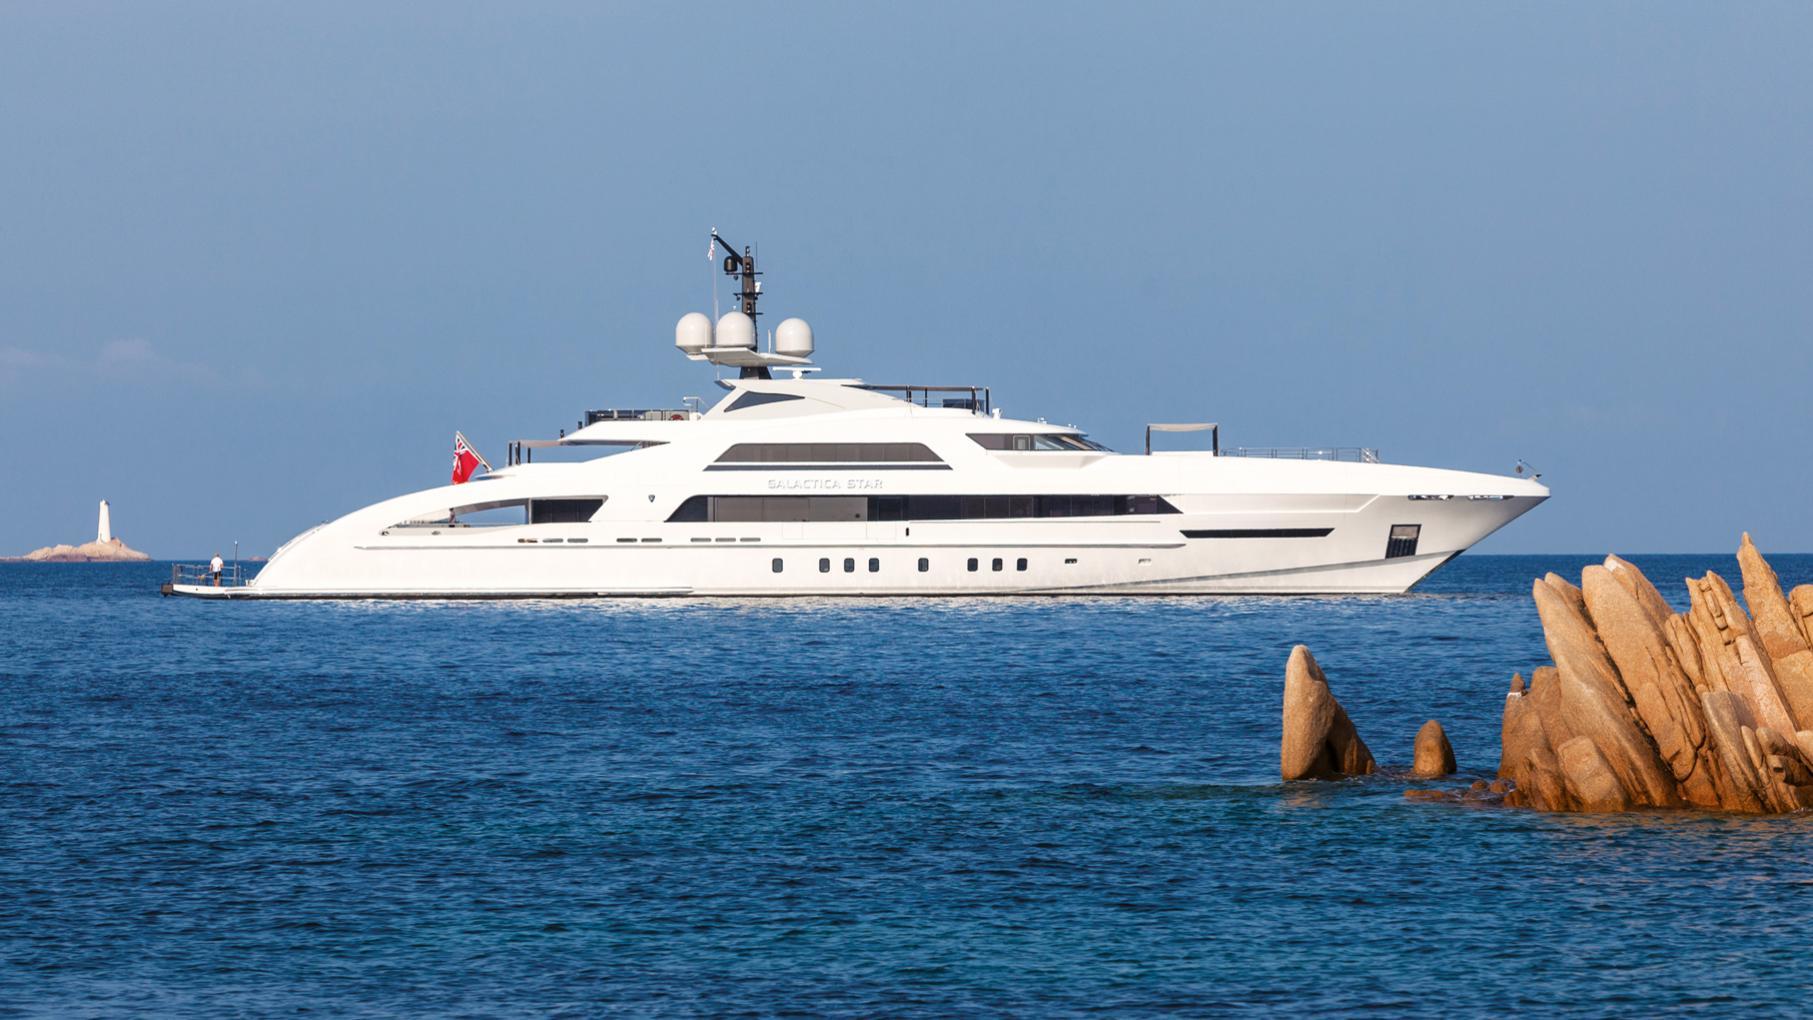 Galactica-Star-motor-yacht-heesen-2013-65m-profile-rocks